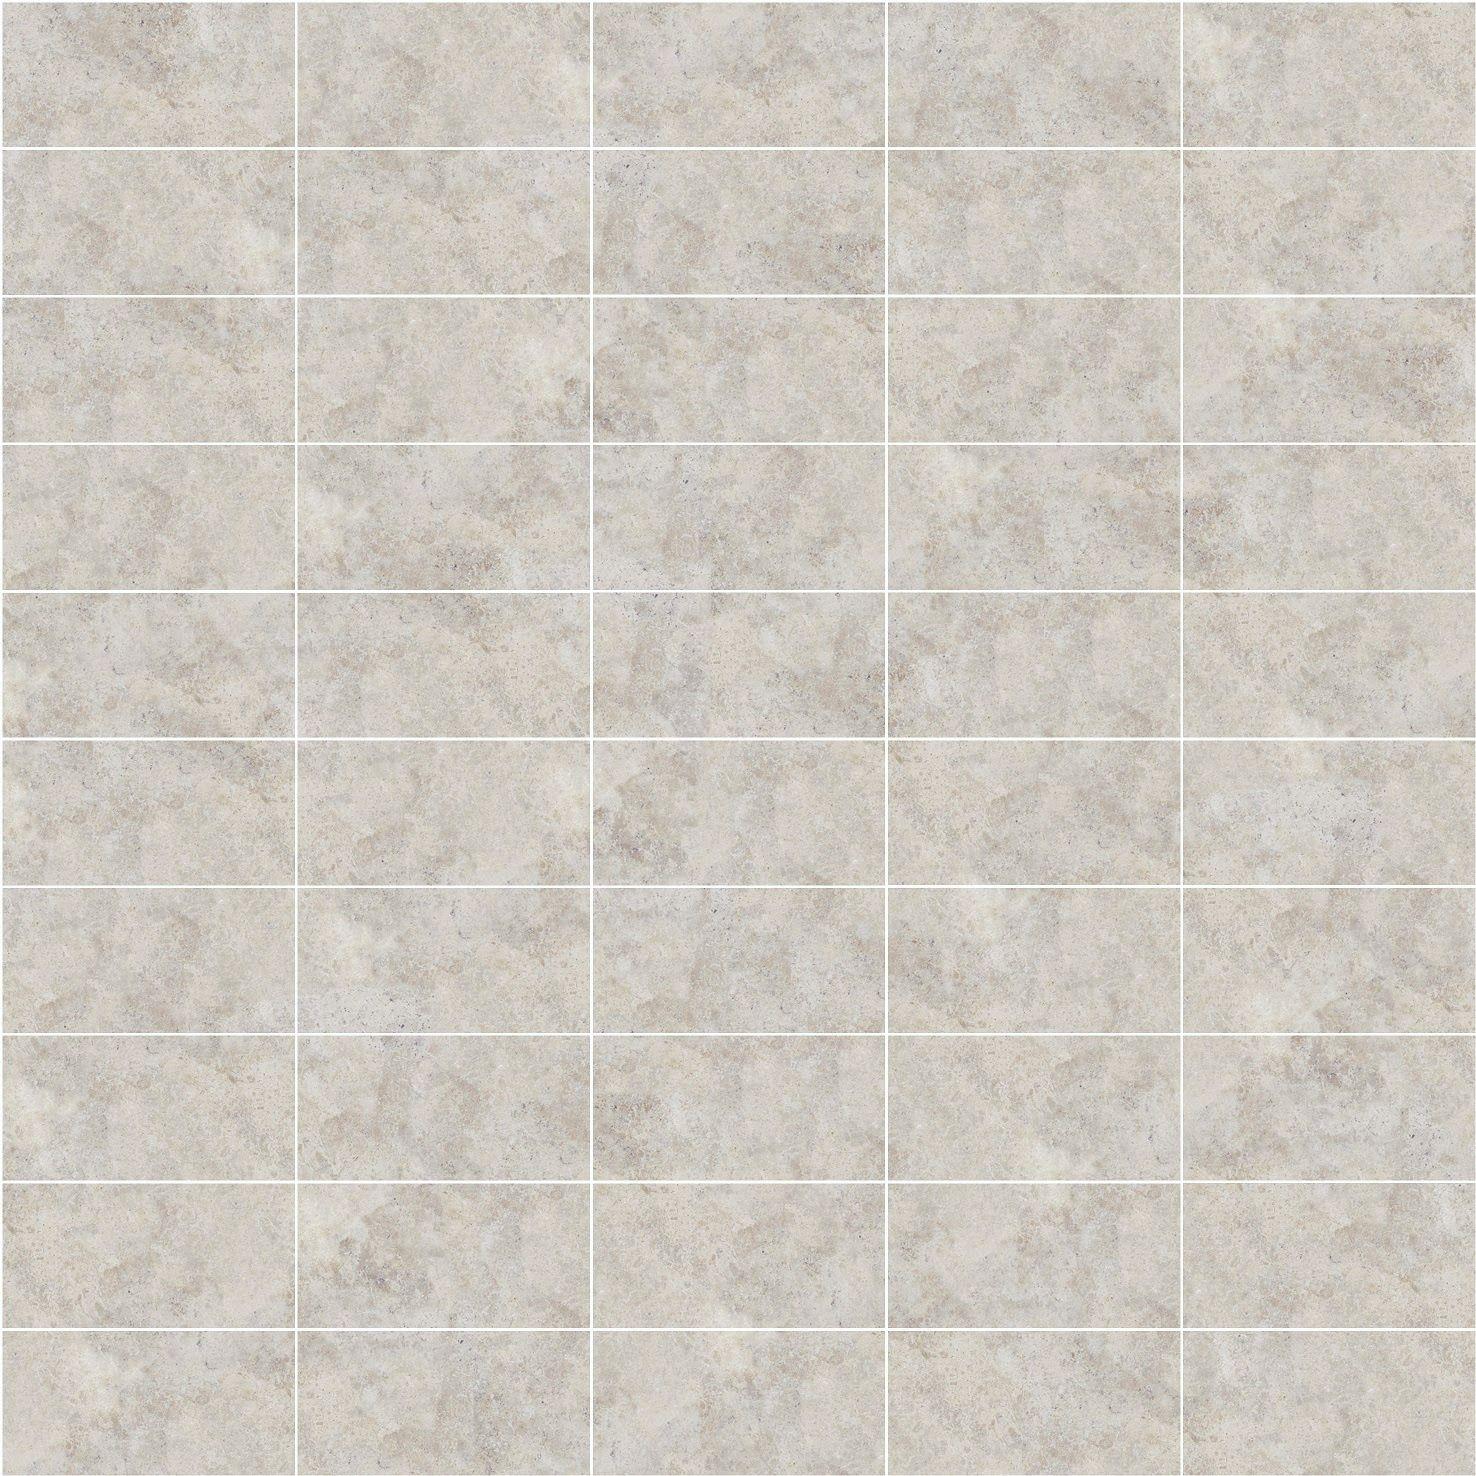 Texture Seamless Pavimento Marmo Simo 3d Jpg 1 476 1 476 Pixel Tiles Texture Tile Floor Floor Texture